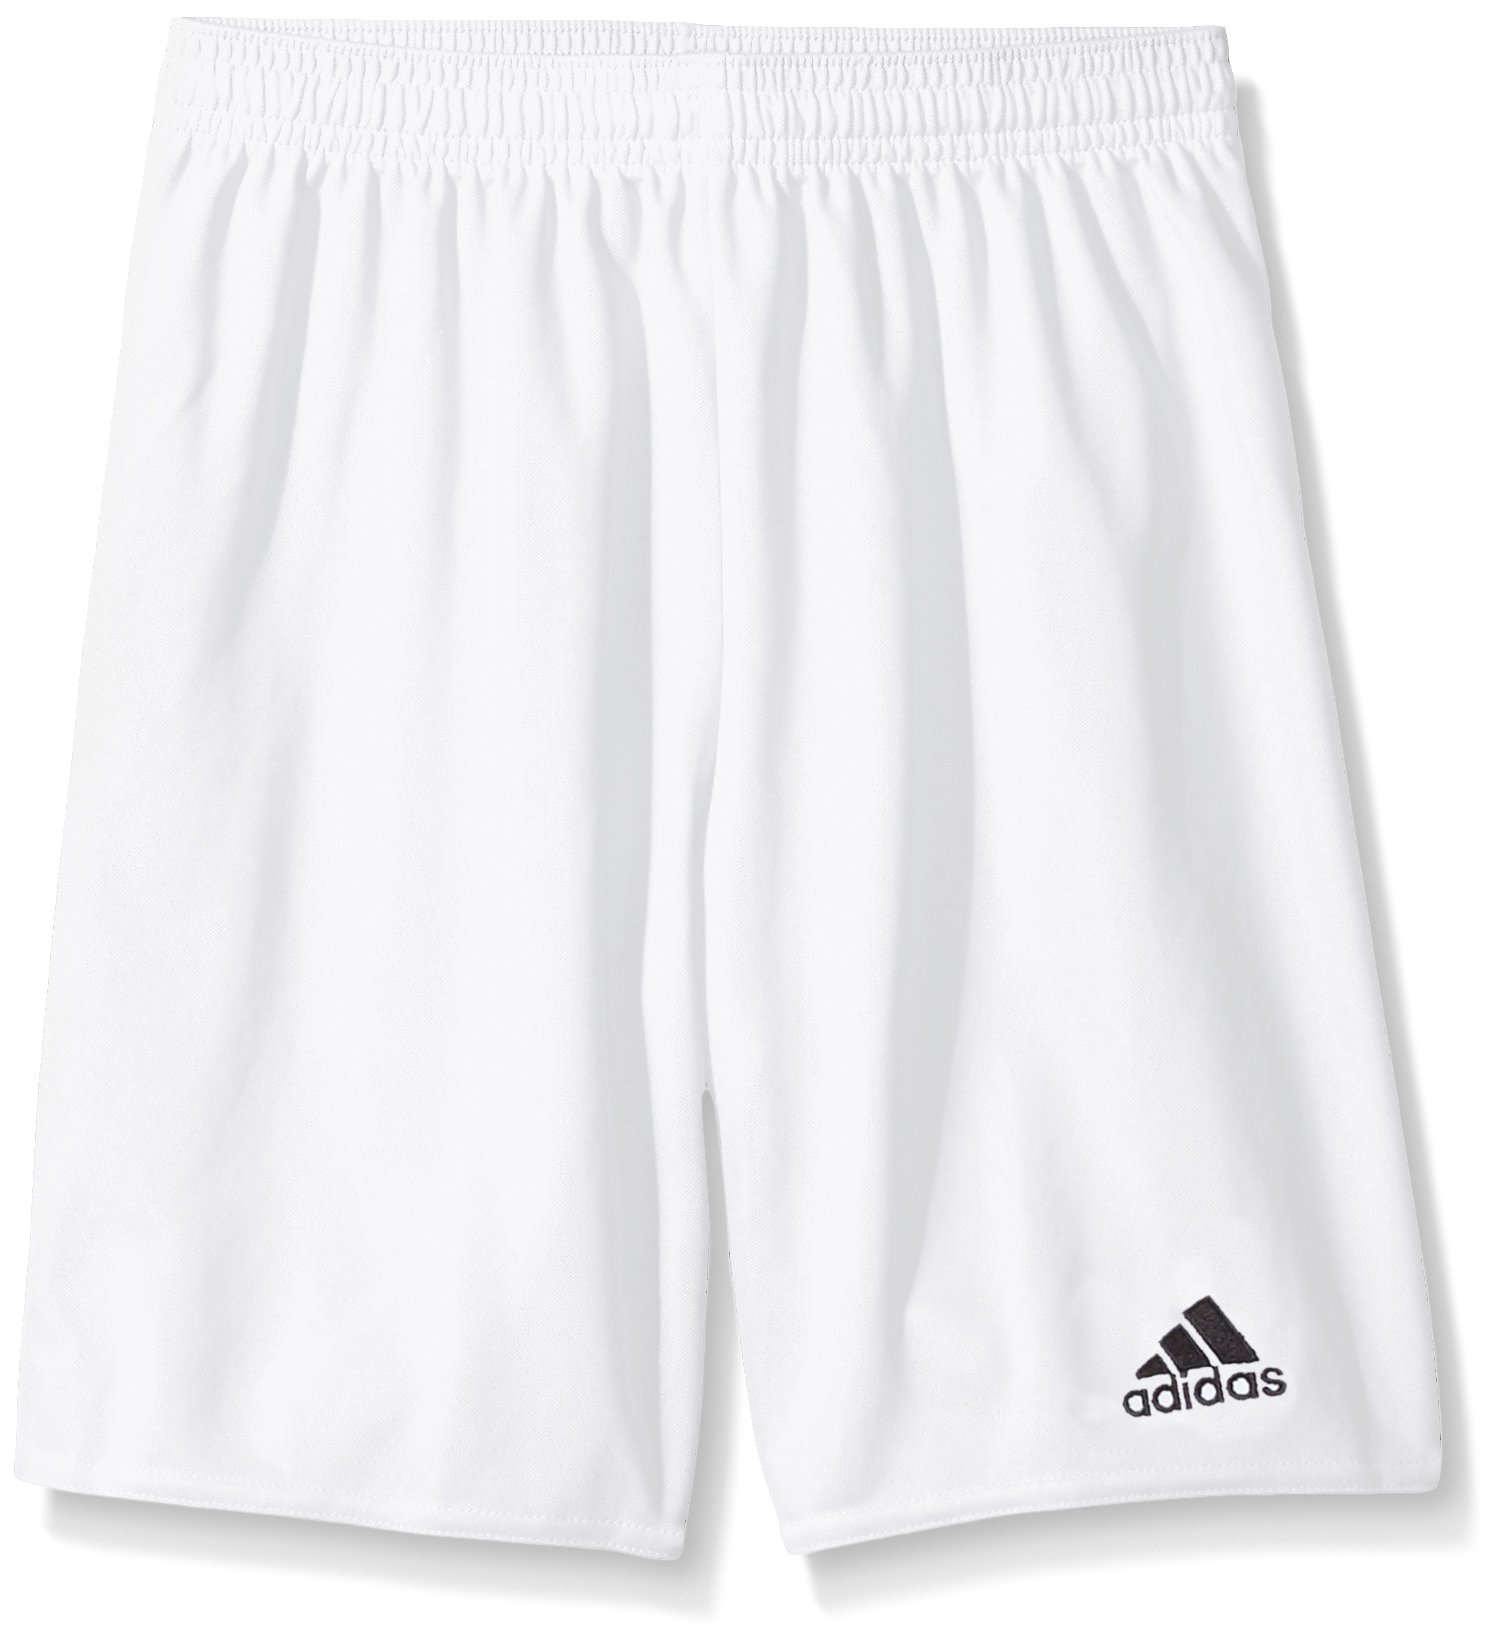 adidas Youth Parma 16 Shorts, White/Black, Medium by adidas